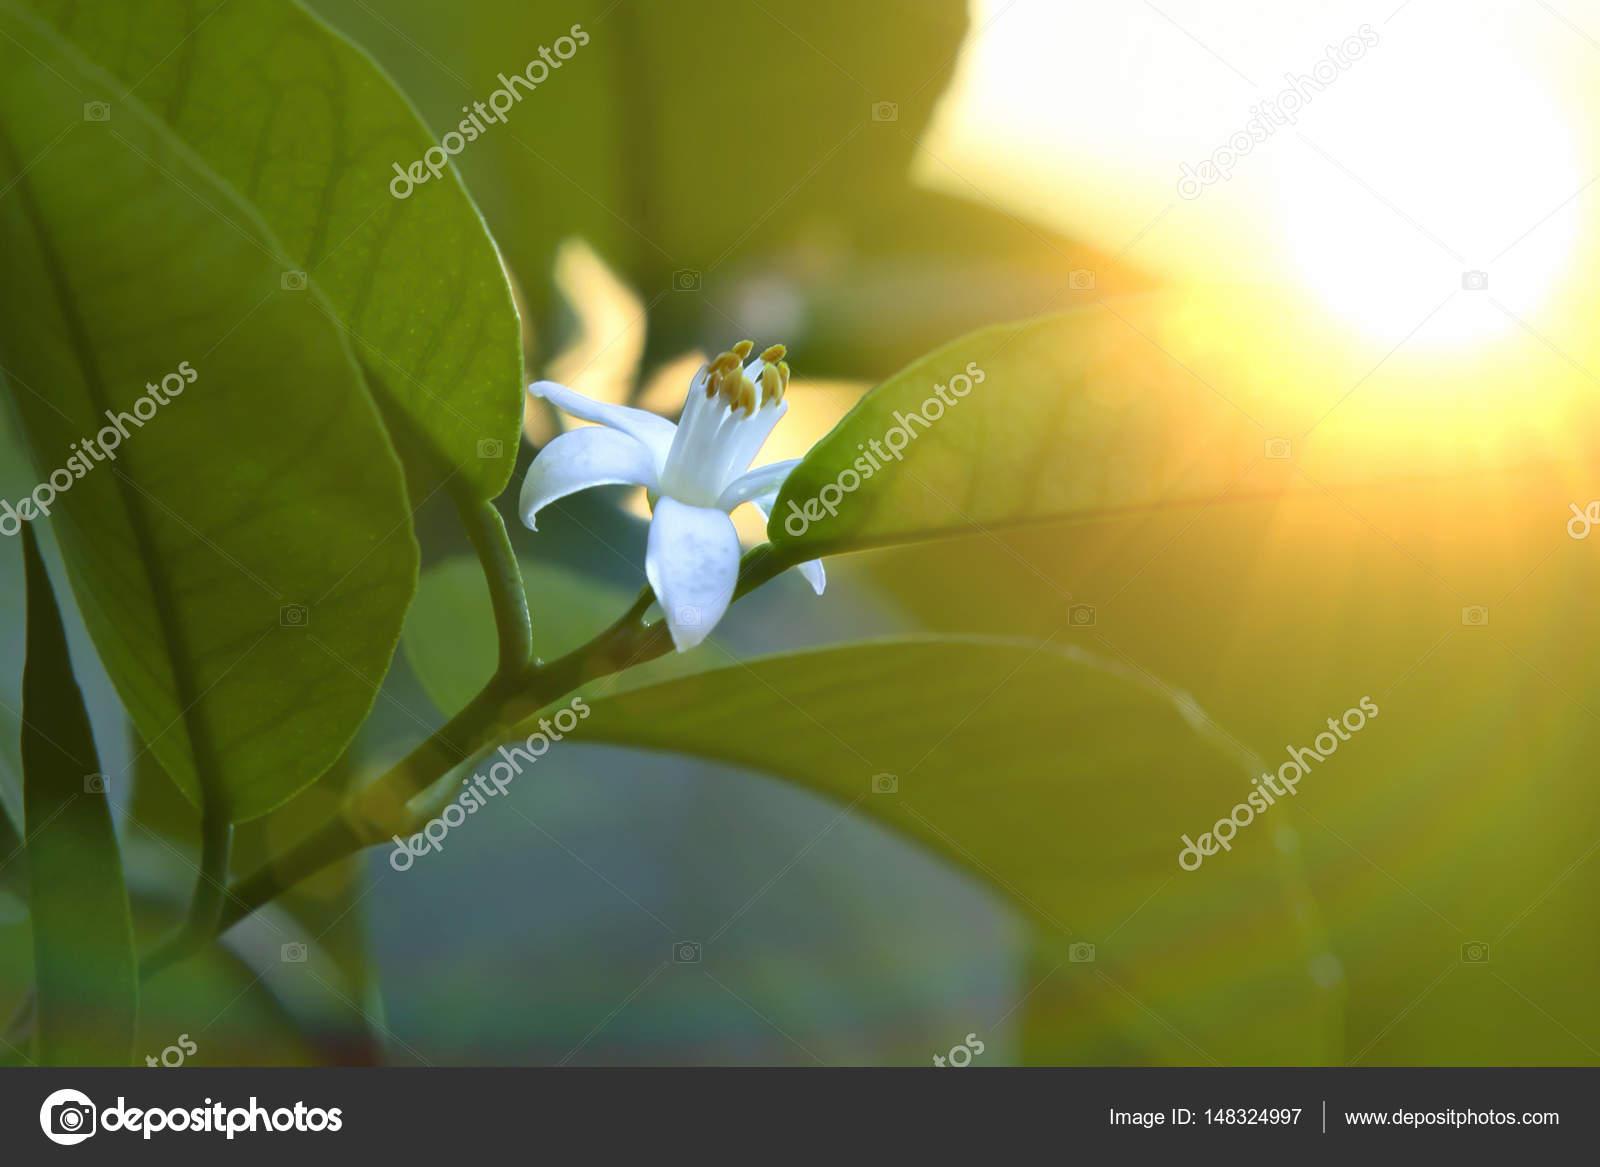 flor de limón sobre una rama — Foto de stock © shelokow #148324997